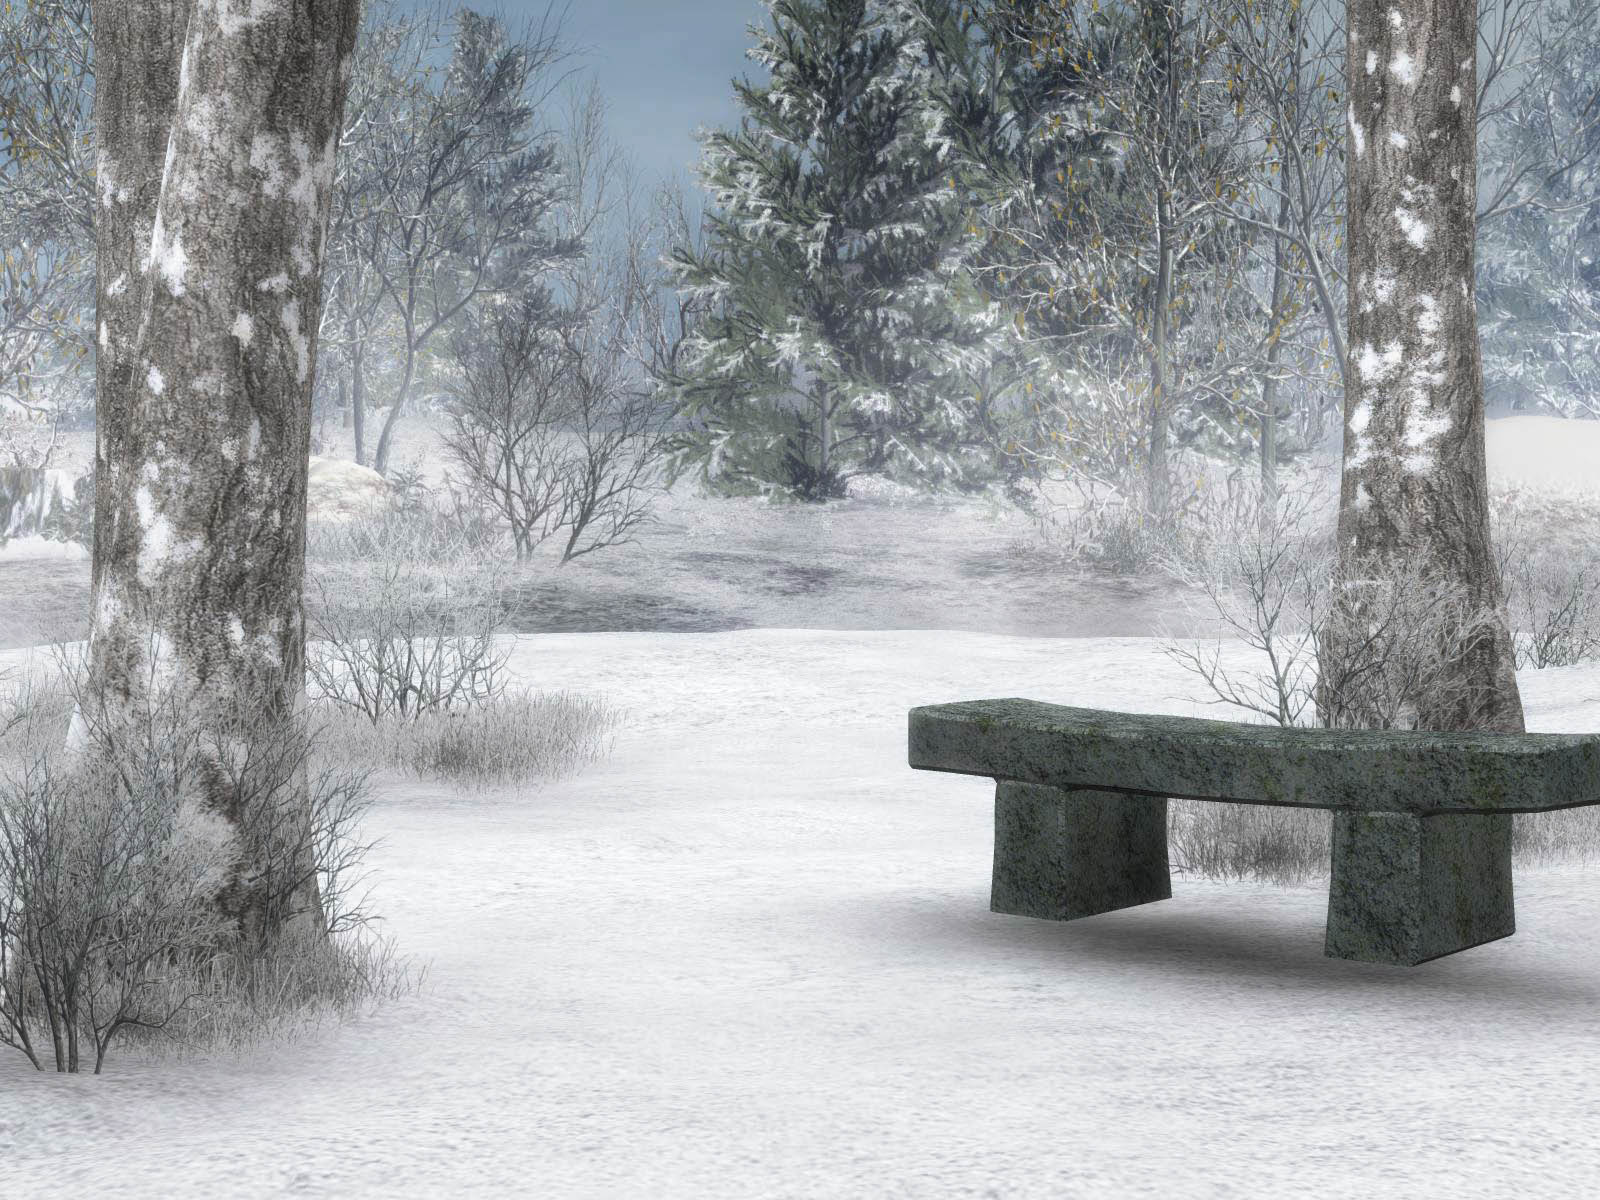 Winter Scene Screensavers wallpaper wallpaper hd background 1600x1200